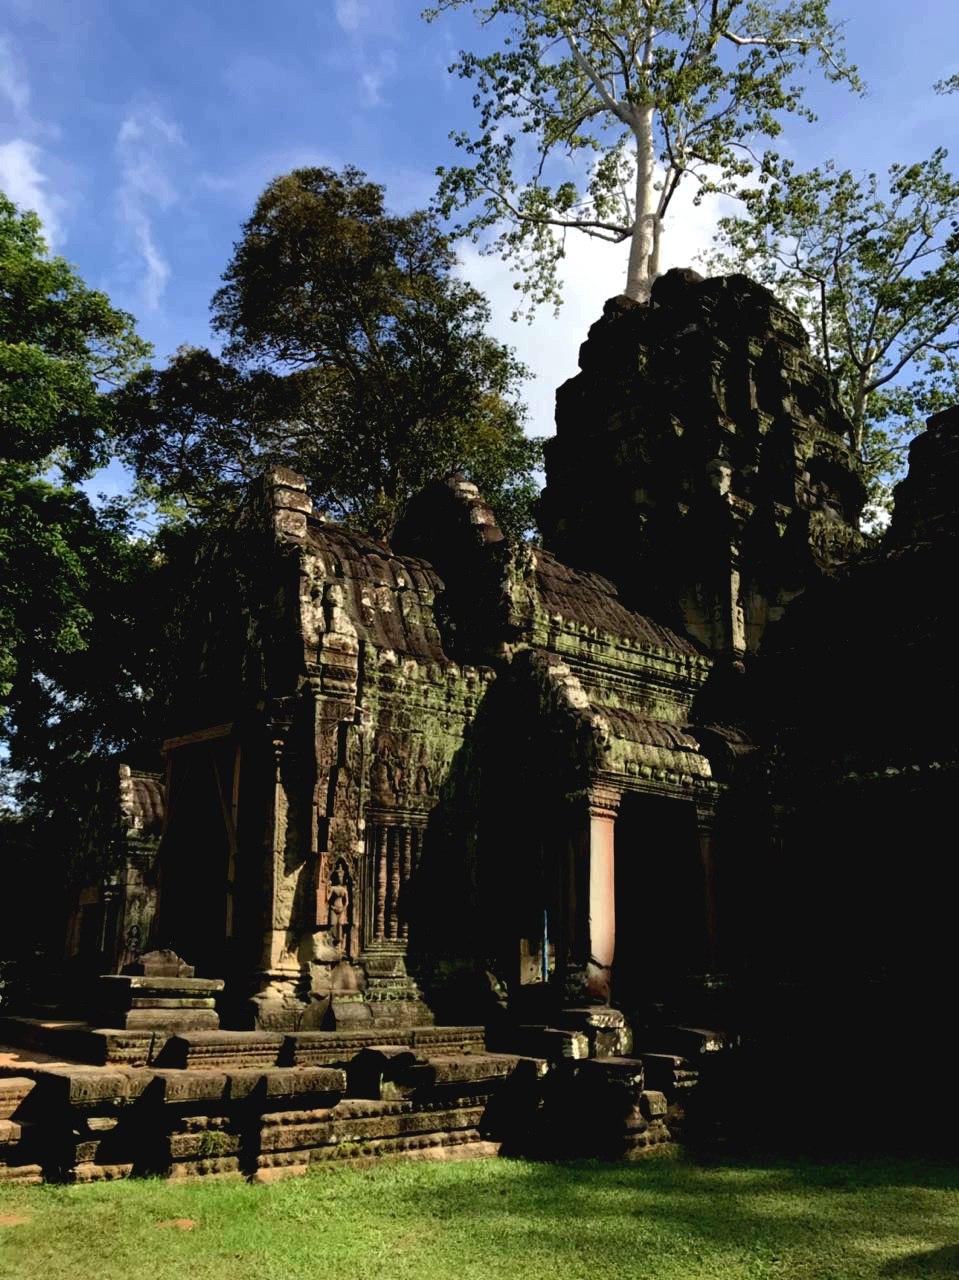 Елена Руденко (Валтея). Камбоджа. Ангкор. JHuFqtVWjD0